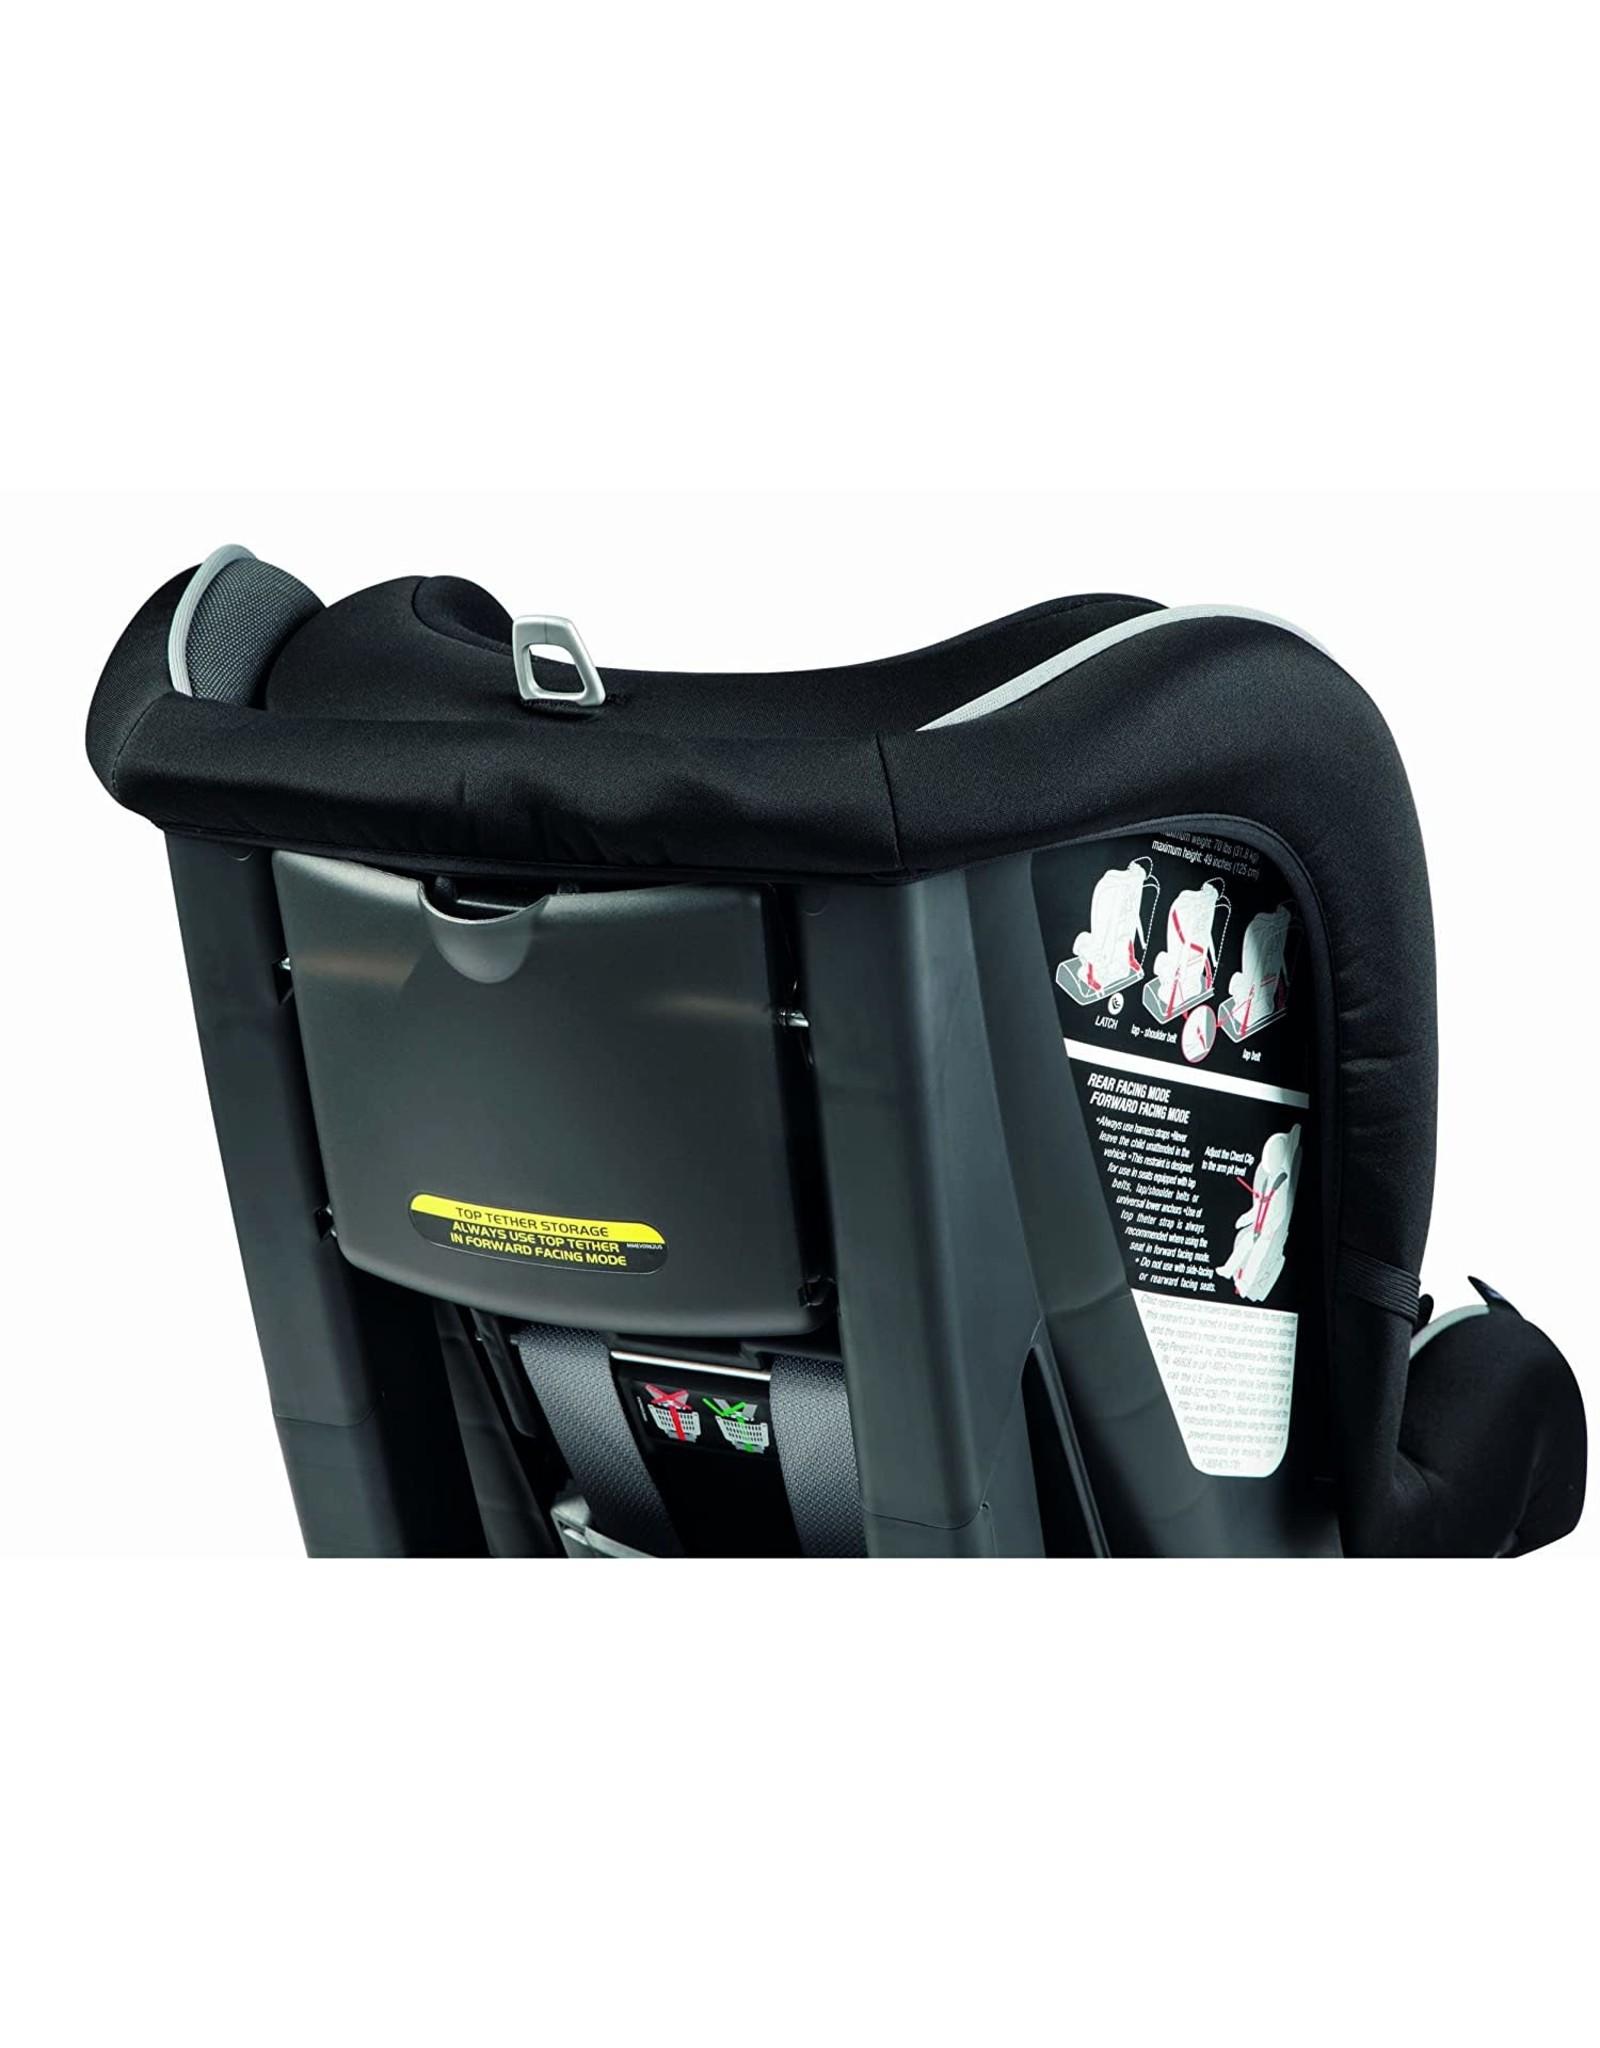 Peg Perego Peg Perego Primo Viaggio Convertible Car Seat, Licorice